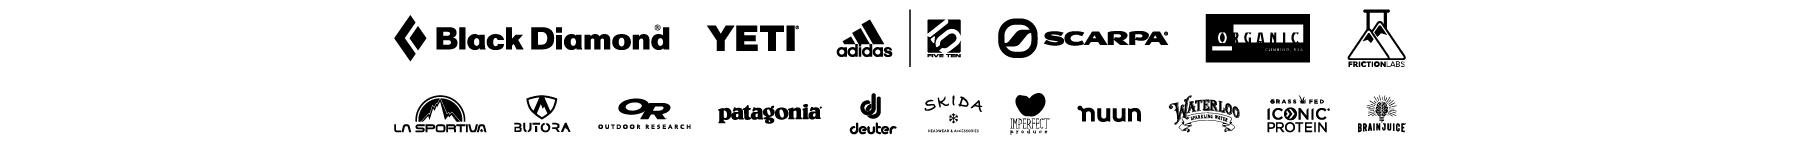 _nwb_tmp_sponsor_logos_www.png